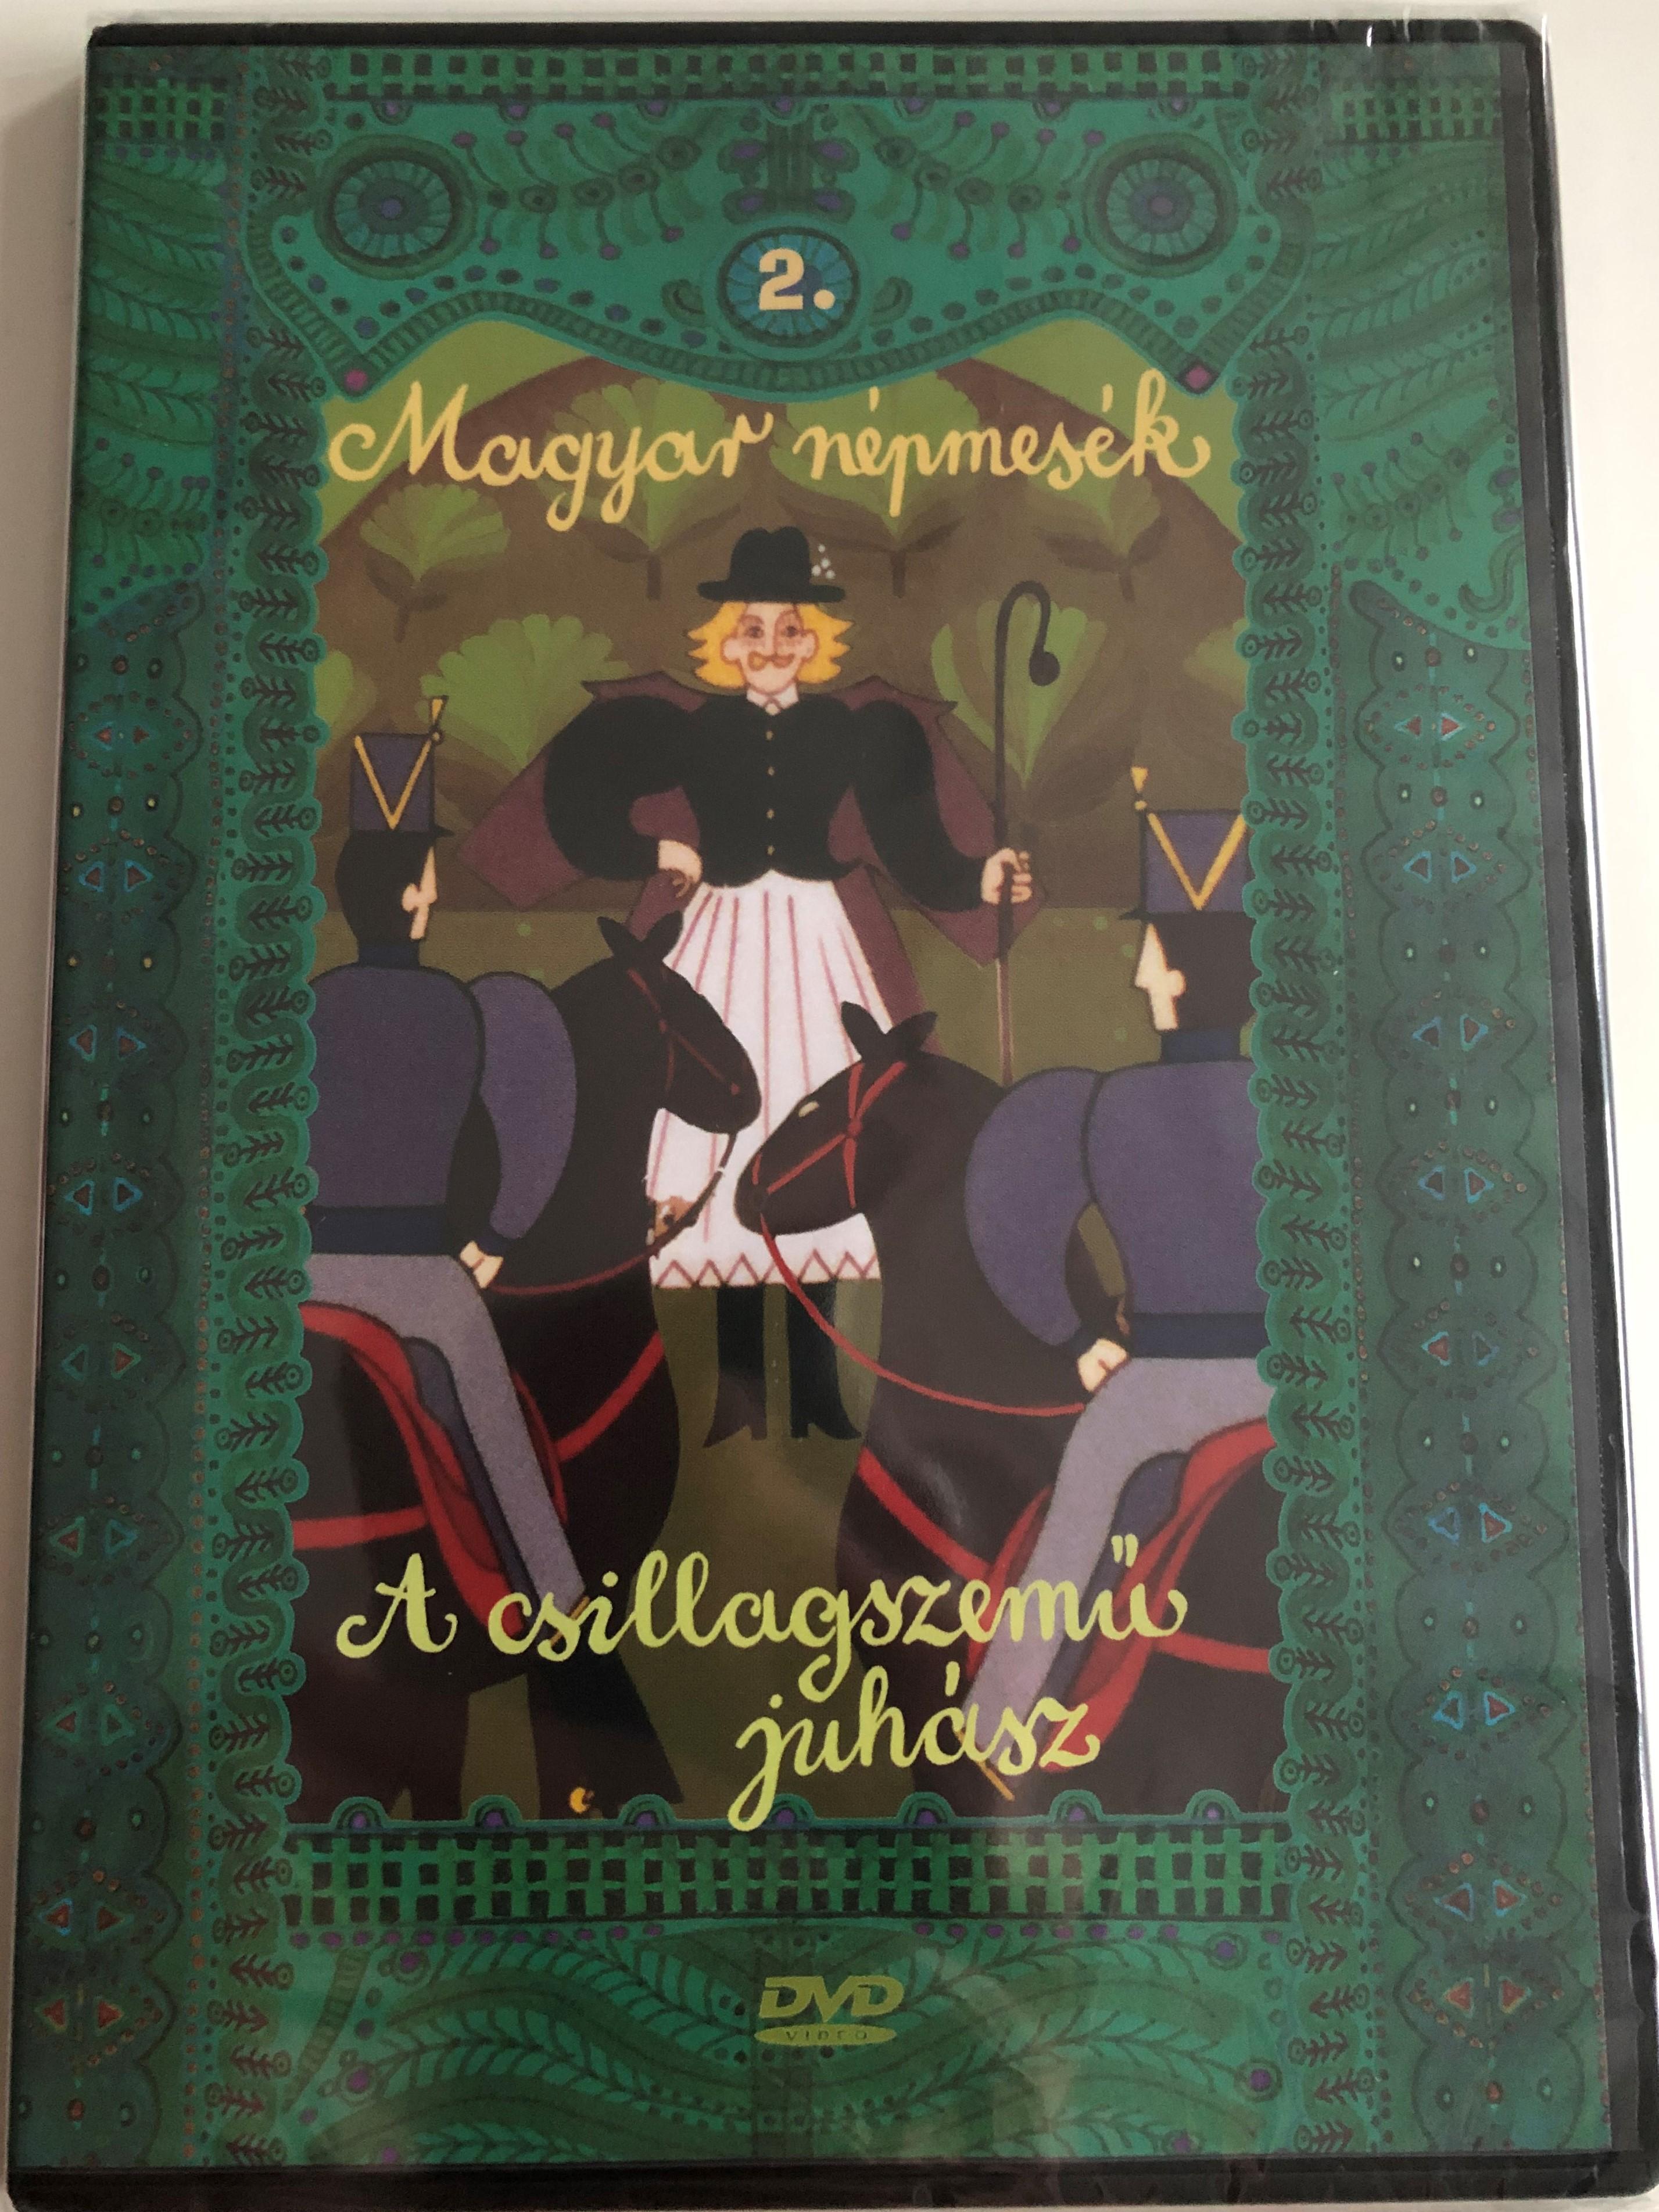 magyar-n-pmes-k-2.-a-csillagszem-juh-sz-dvd-1979-1980-hungarian-folk-tales-for-children-1-.jpg